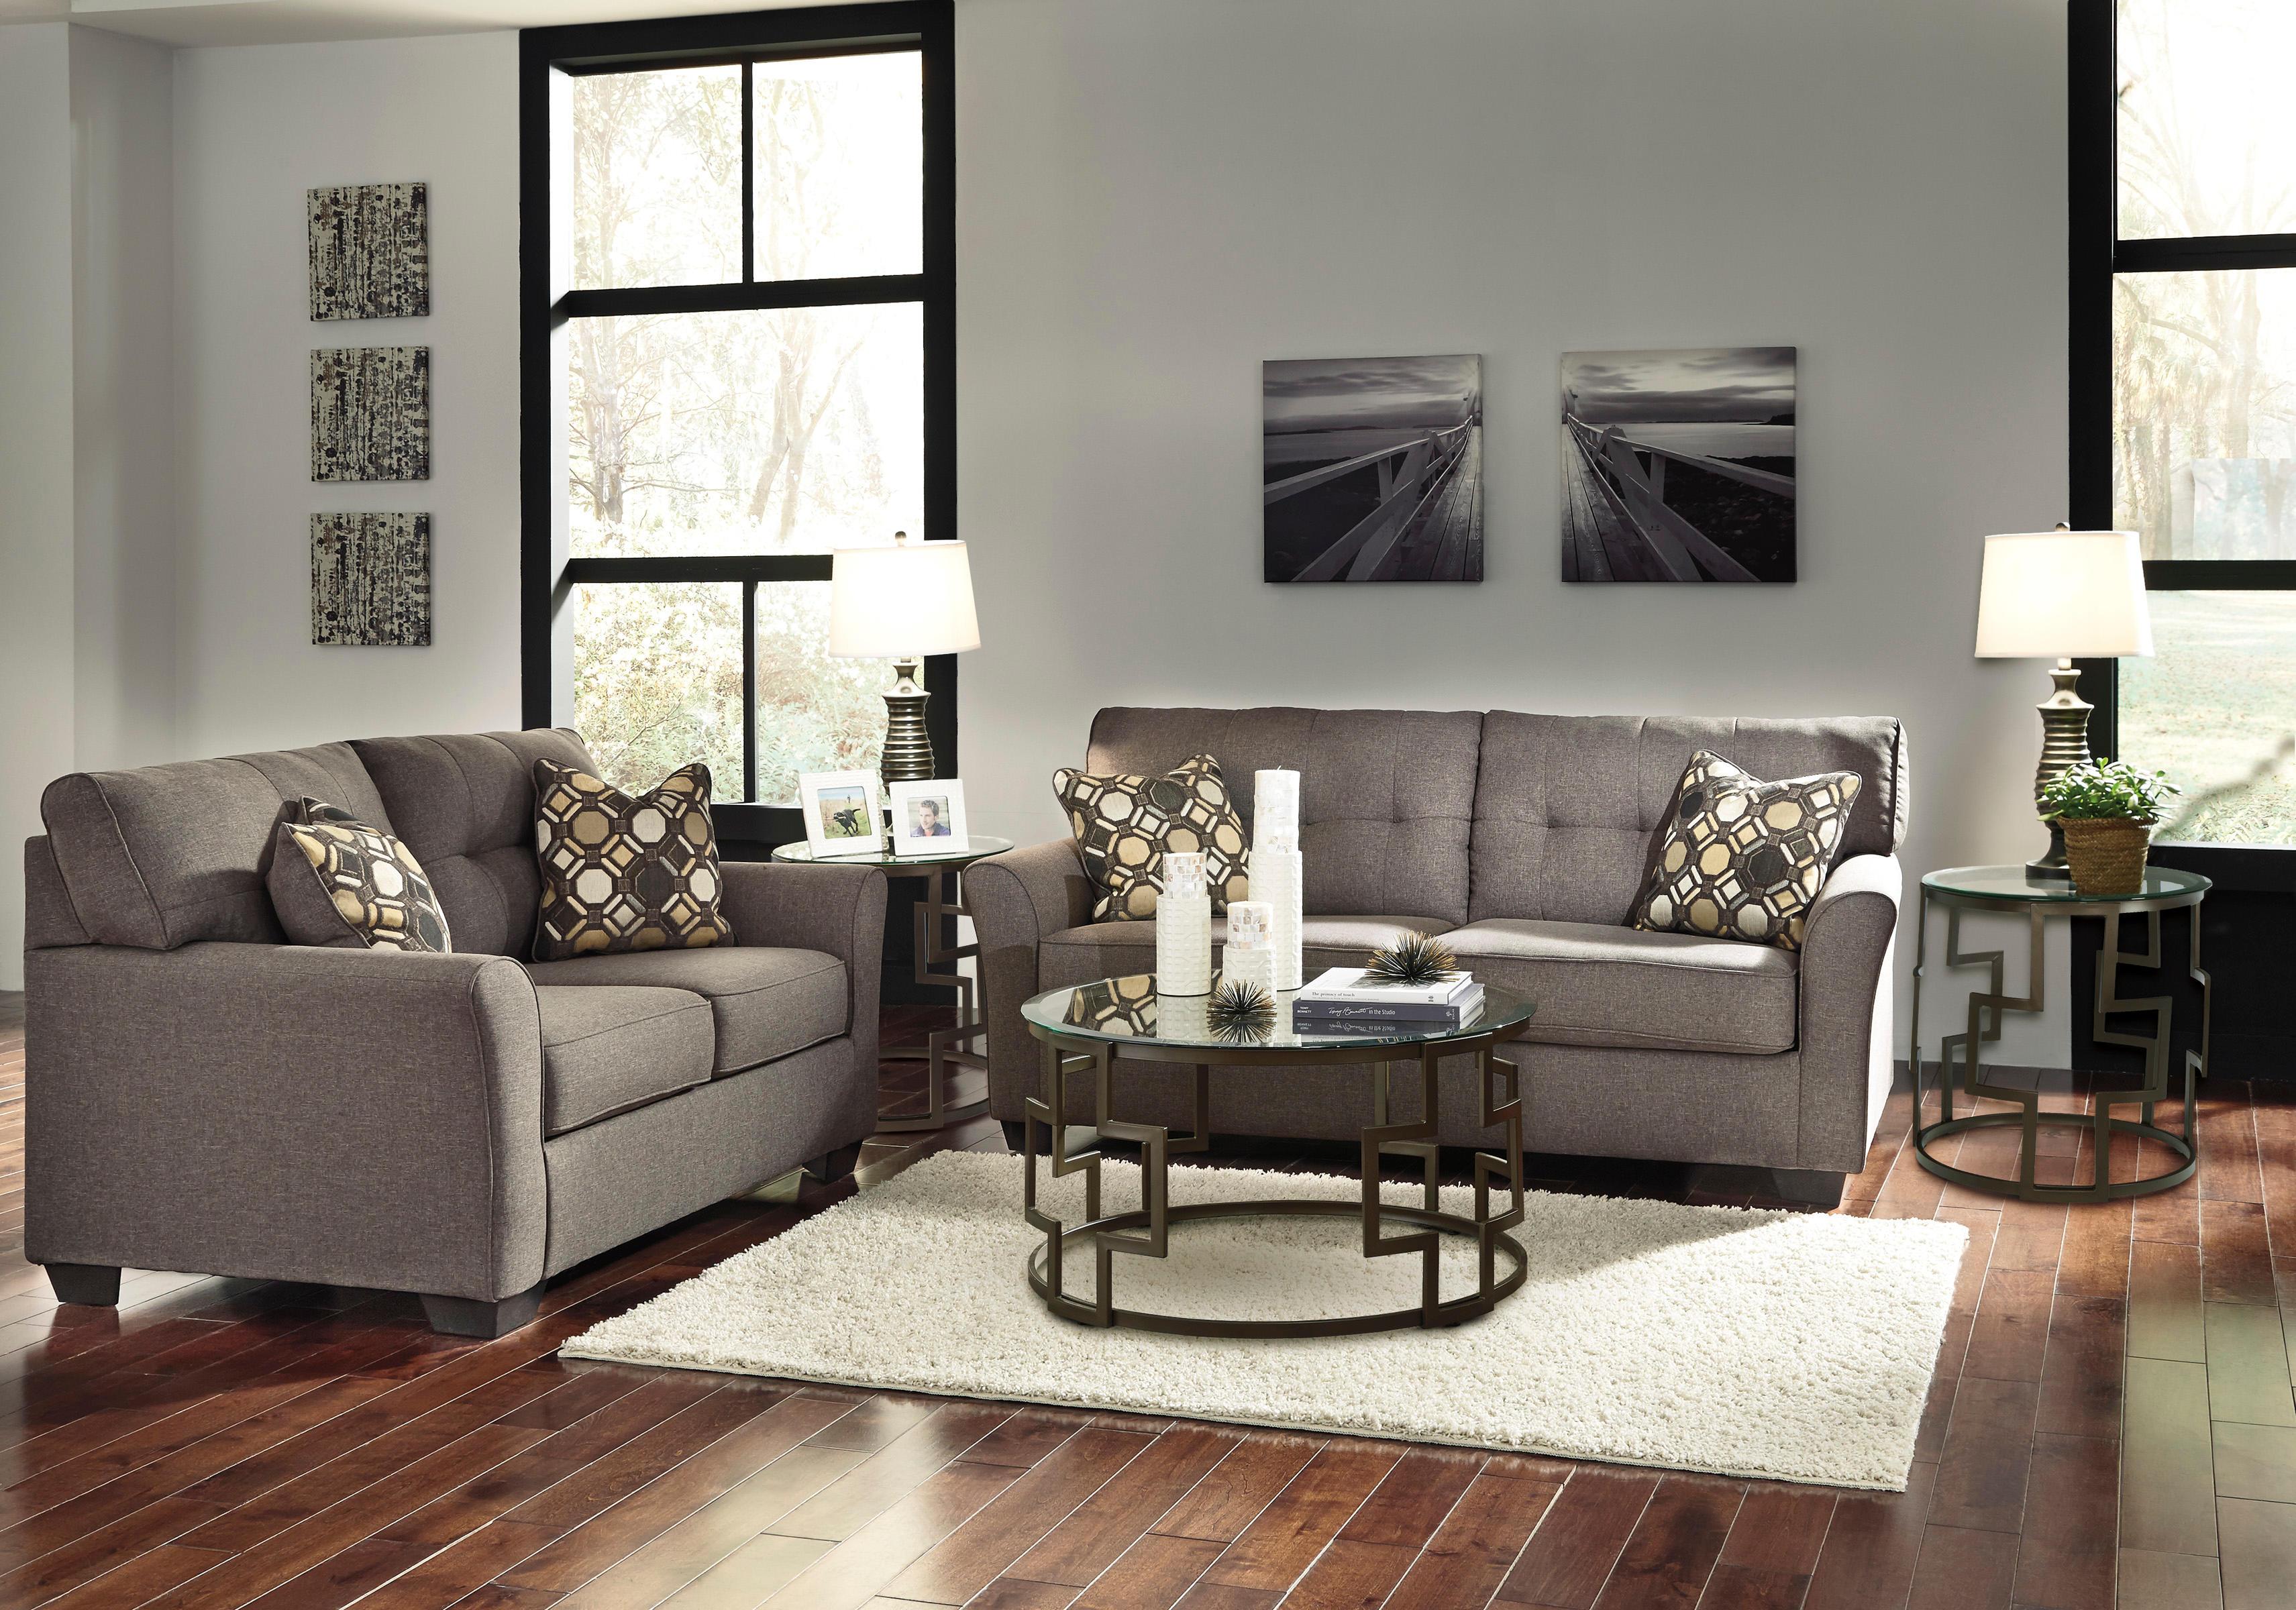 Fashion Home Furniture Garland Tx 28 Images Fashion Home Furniture 28 Images Home Furniture